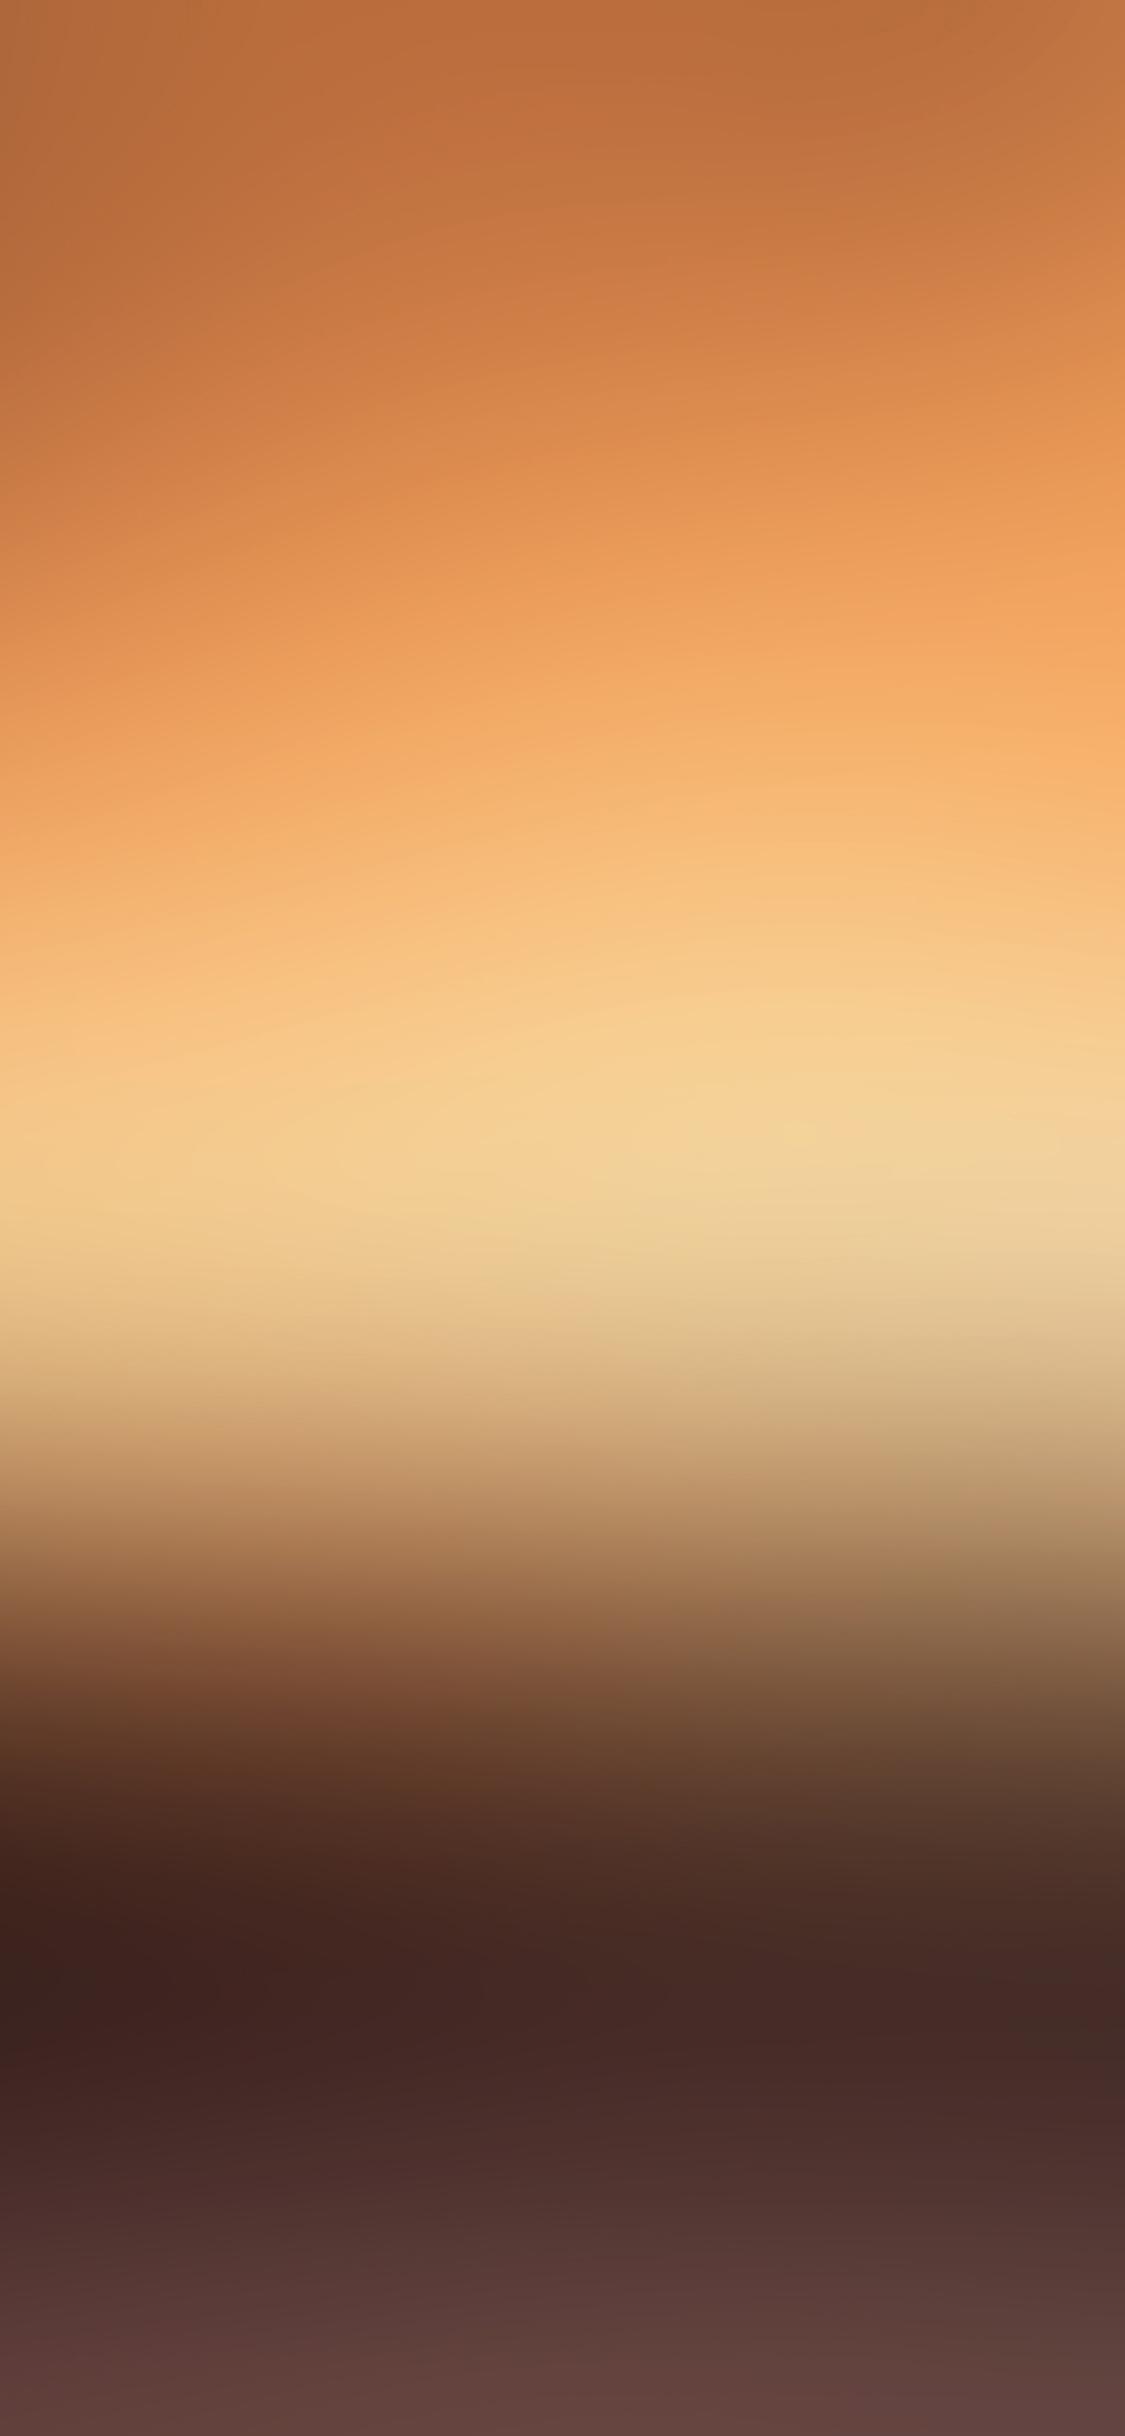 iPhoneXpapers.com-Apple-iPhone-wallpaper-sc37-sunset-at-mount-high-blur